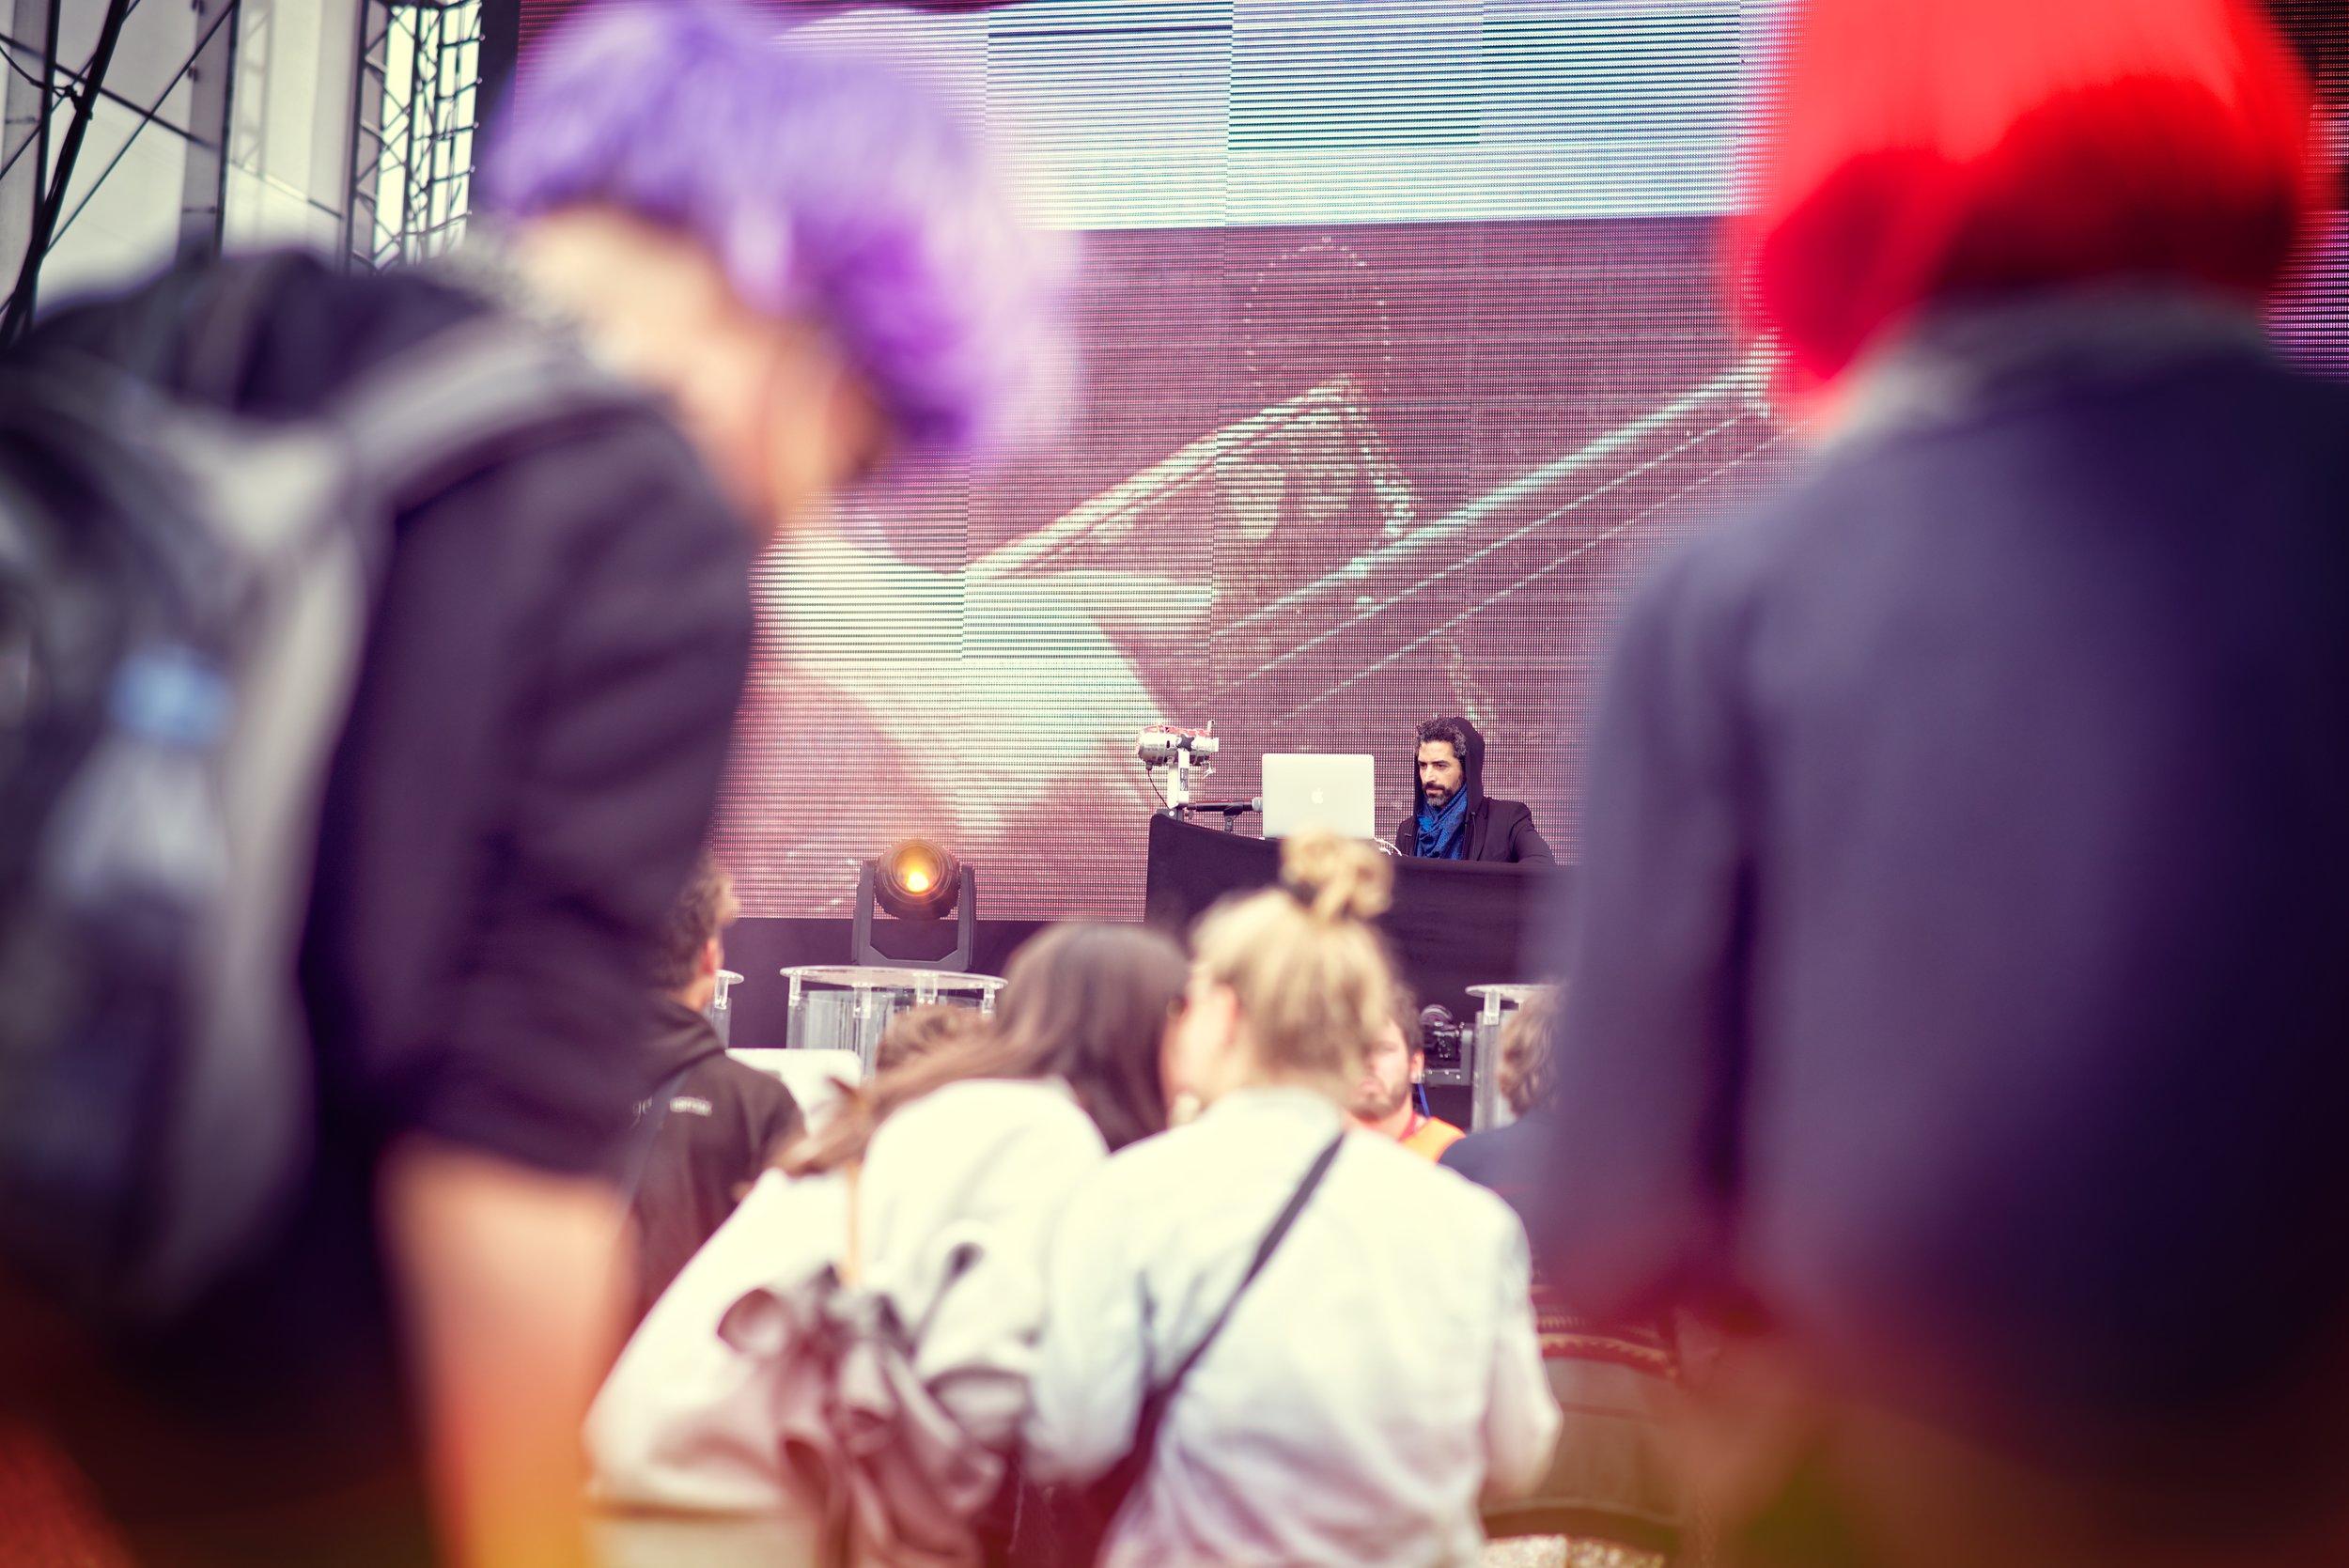 2016.07.02 - Roskilde Festival (Nikon D750 85mm)_21 - Nicely Toasted Minus Texturizer.jpg